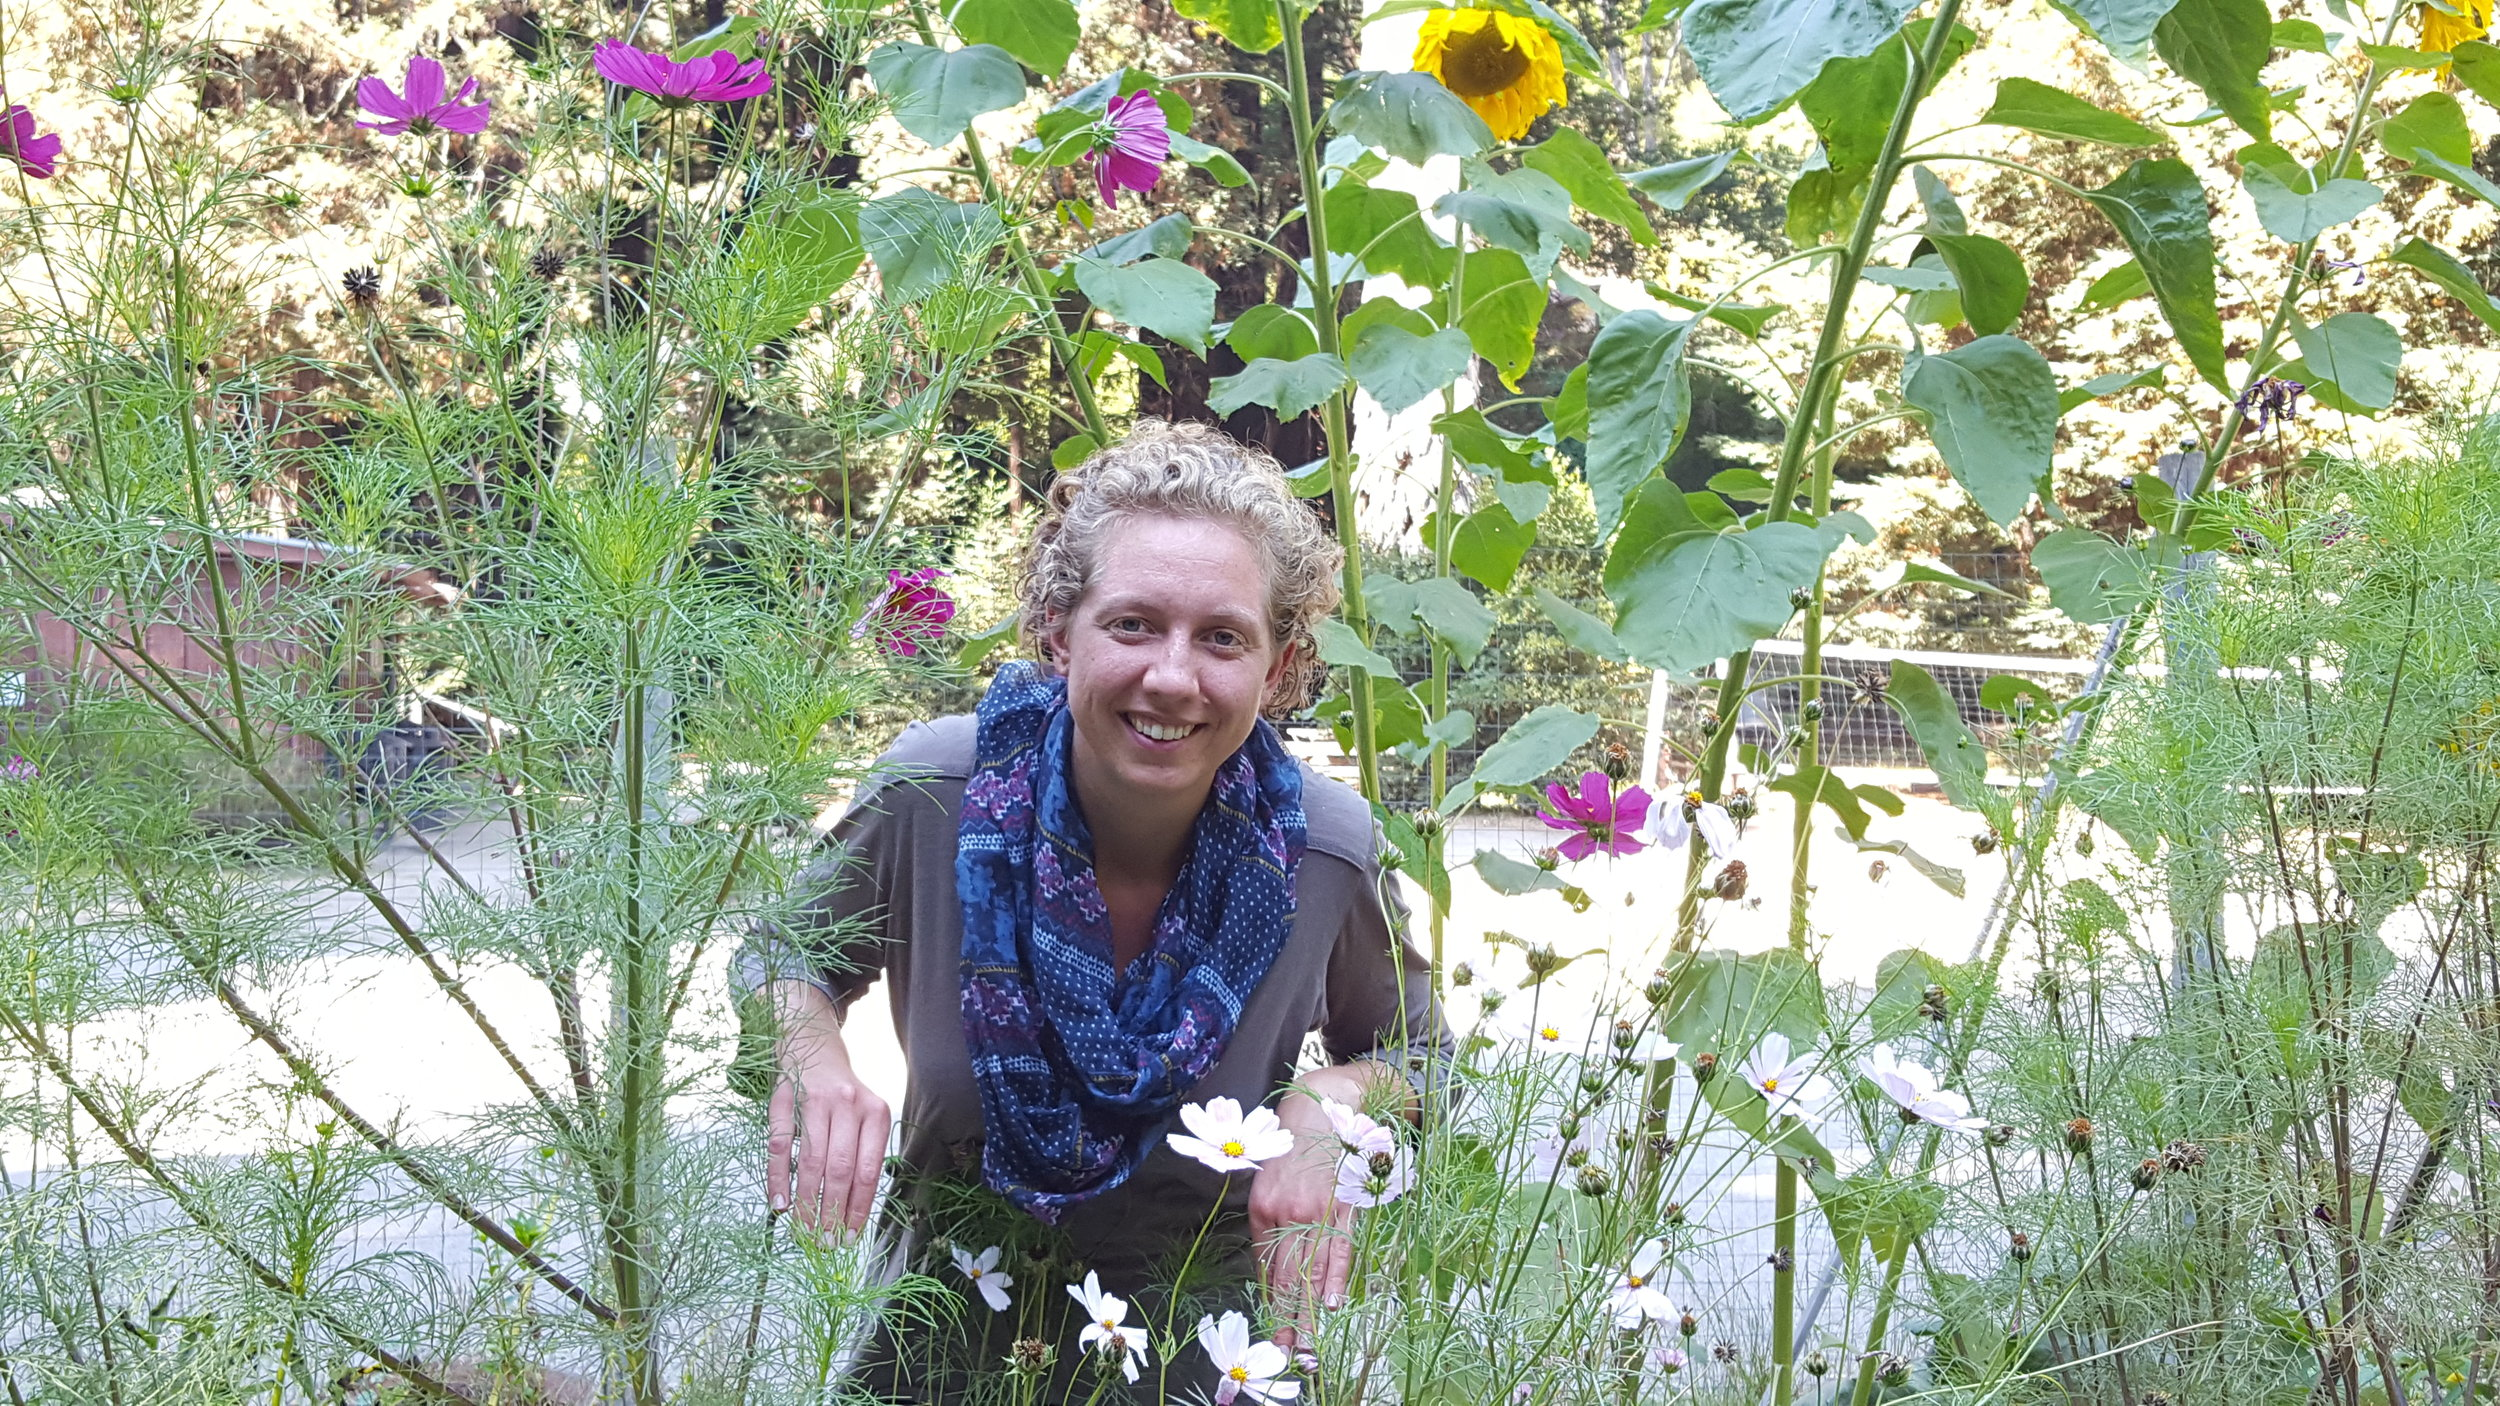 Claire Roberts, Naturalist